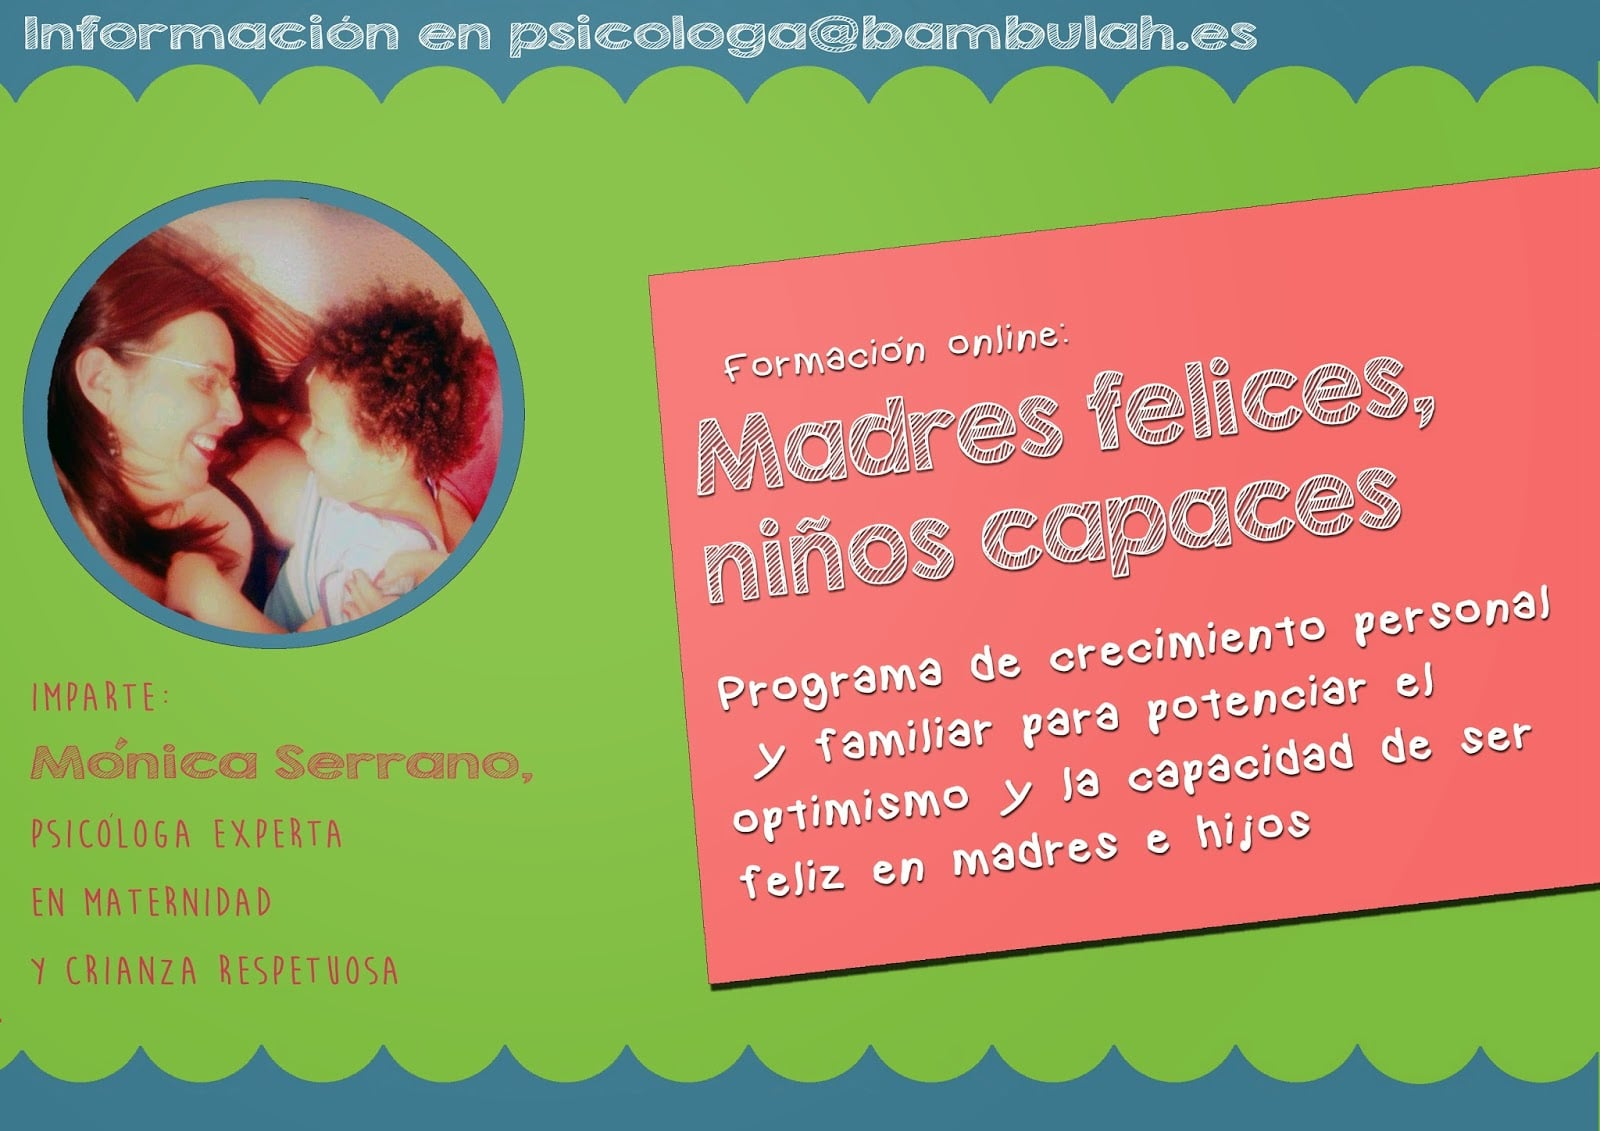 https://www.psicologiaycrianza.com/2015/04/madres-felices-ninos-capaces.html